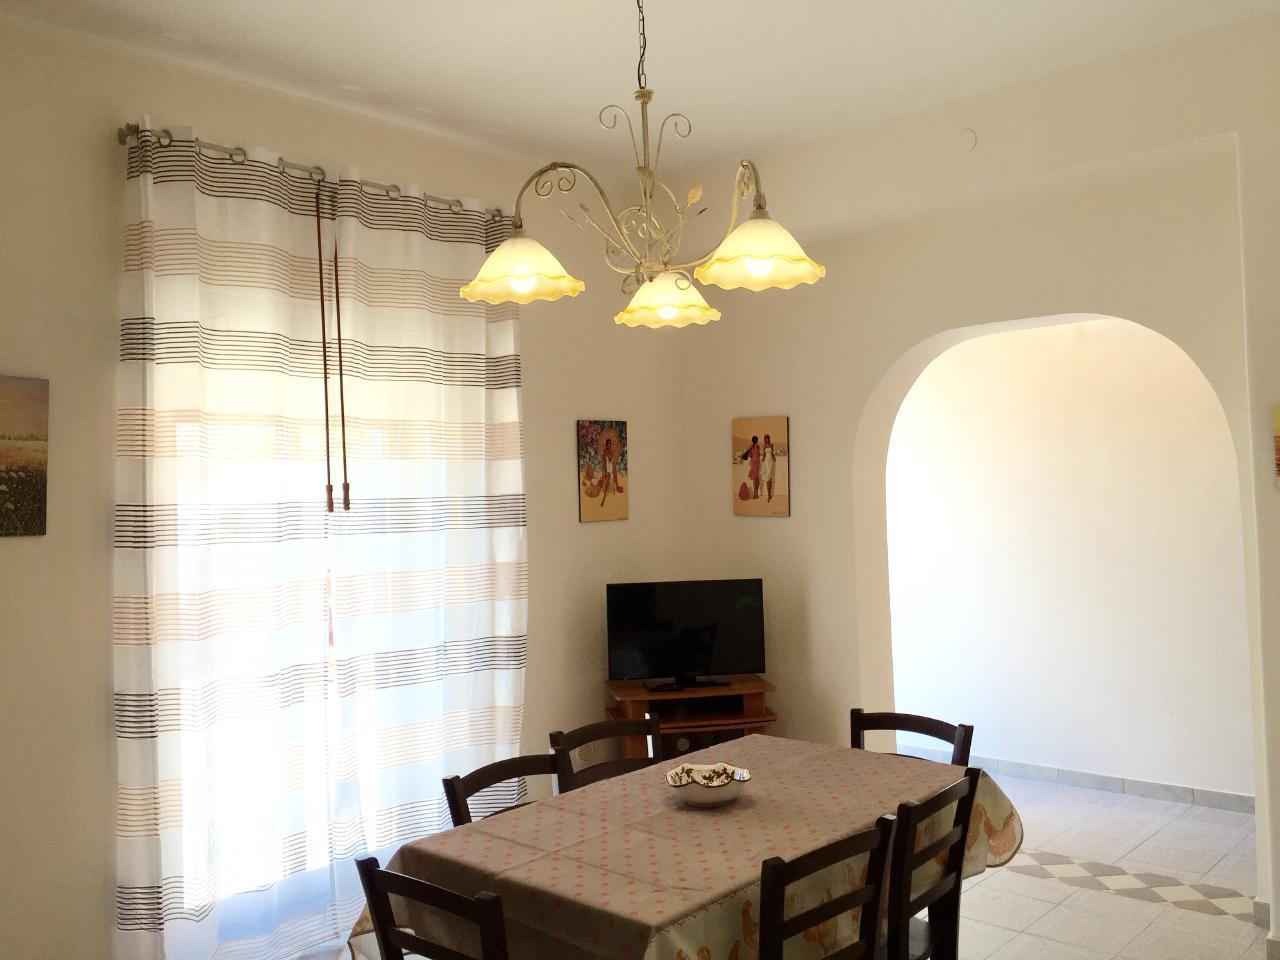 Maison de vacances Etna Dimora dei Saponari (2170785), Trecastagni, Catania, Sicile, Italie, image 8